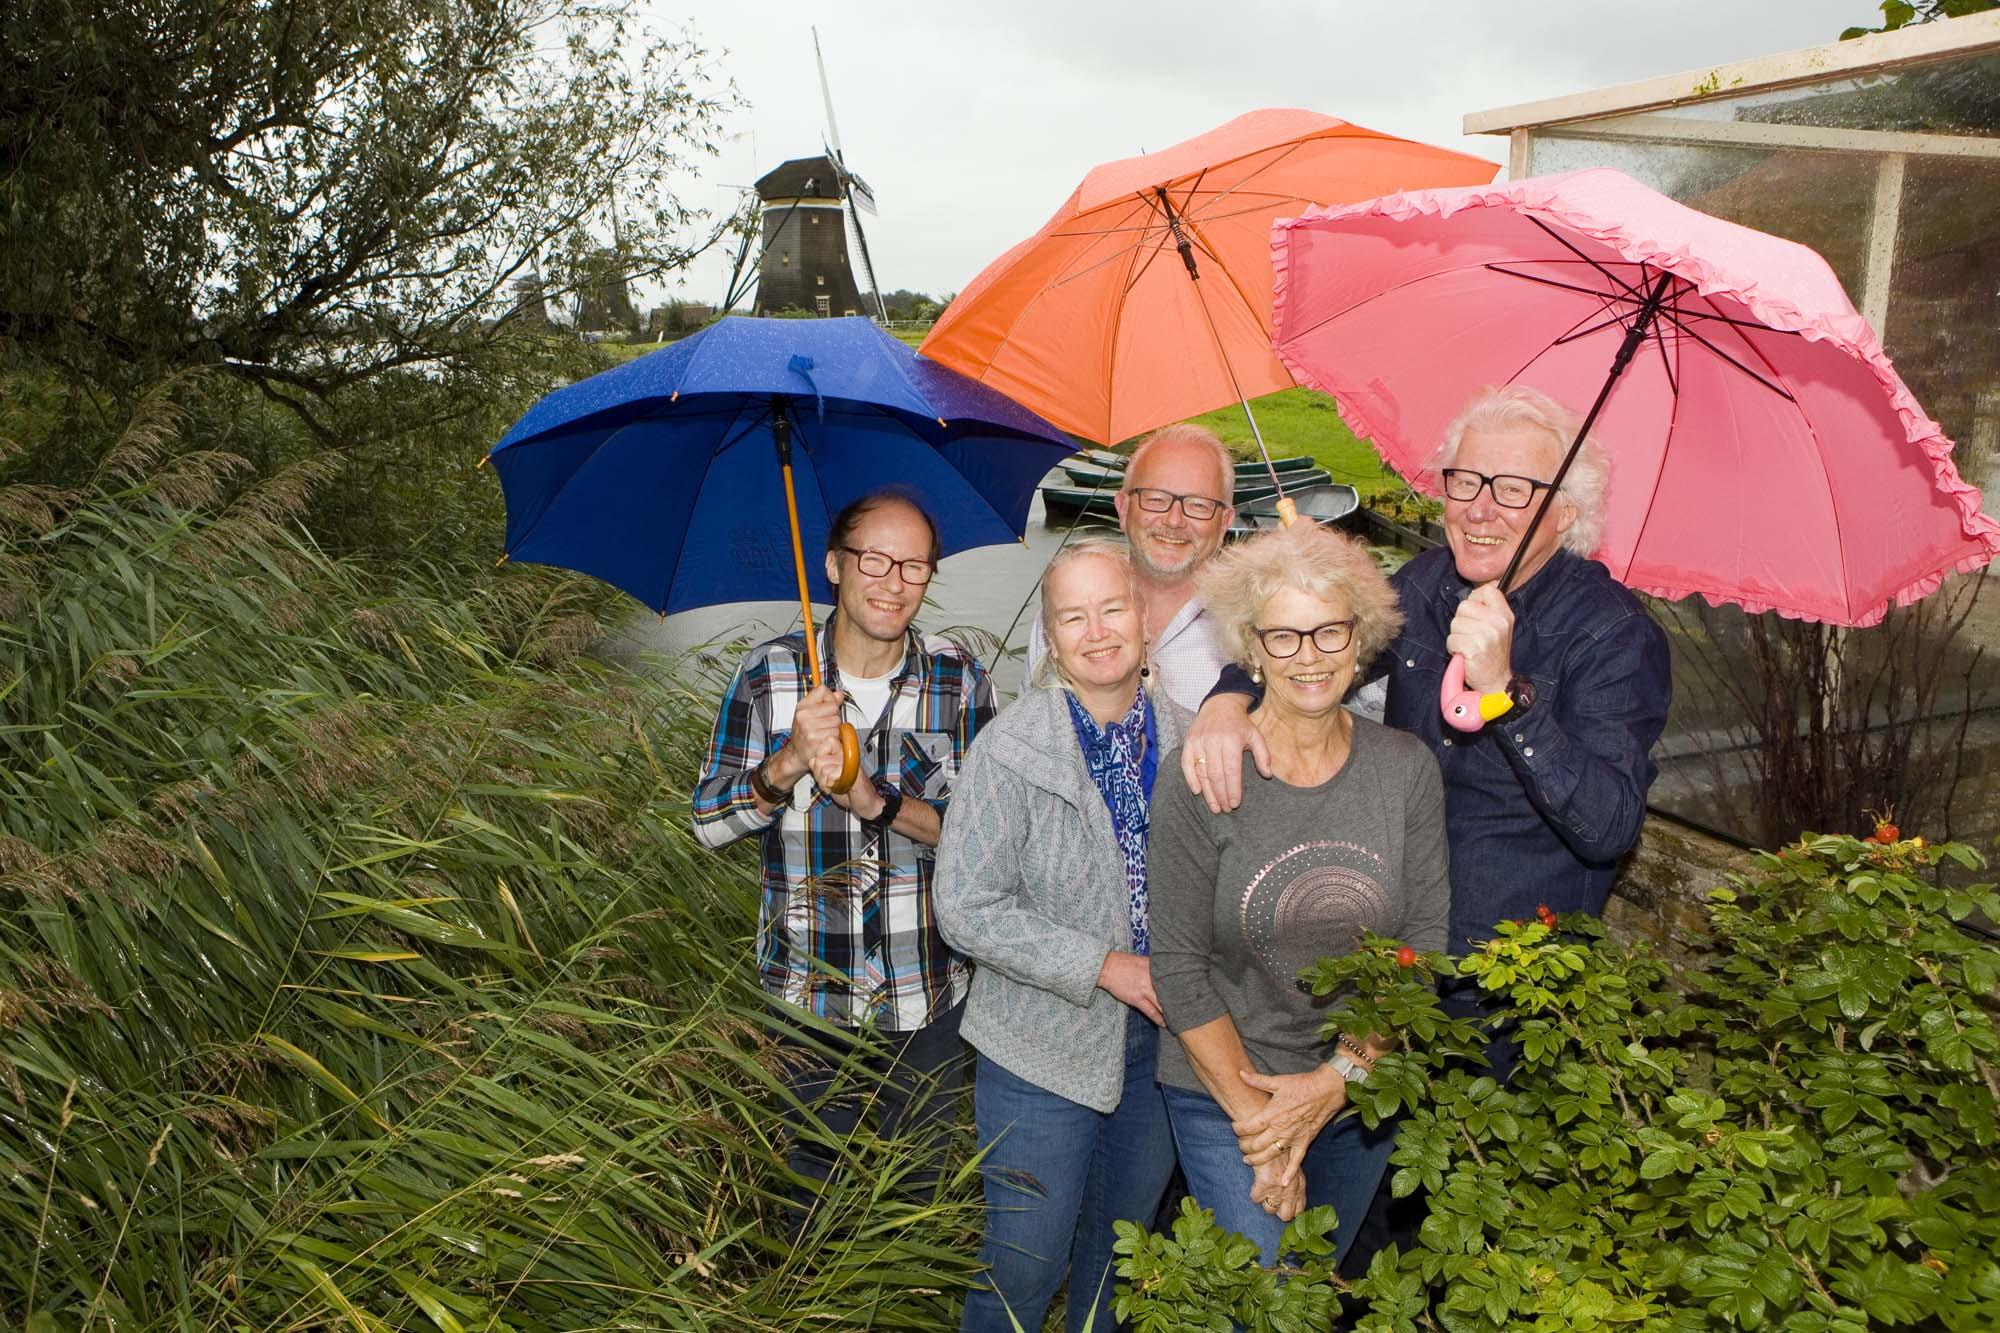 Foto gezinsportret familieportret in regen met paraplu Molendriegang Leidschendam